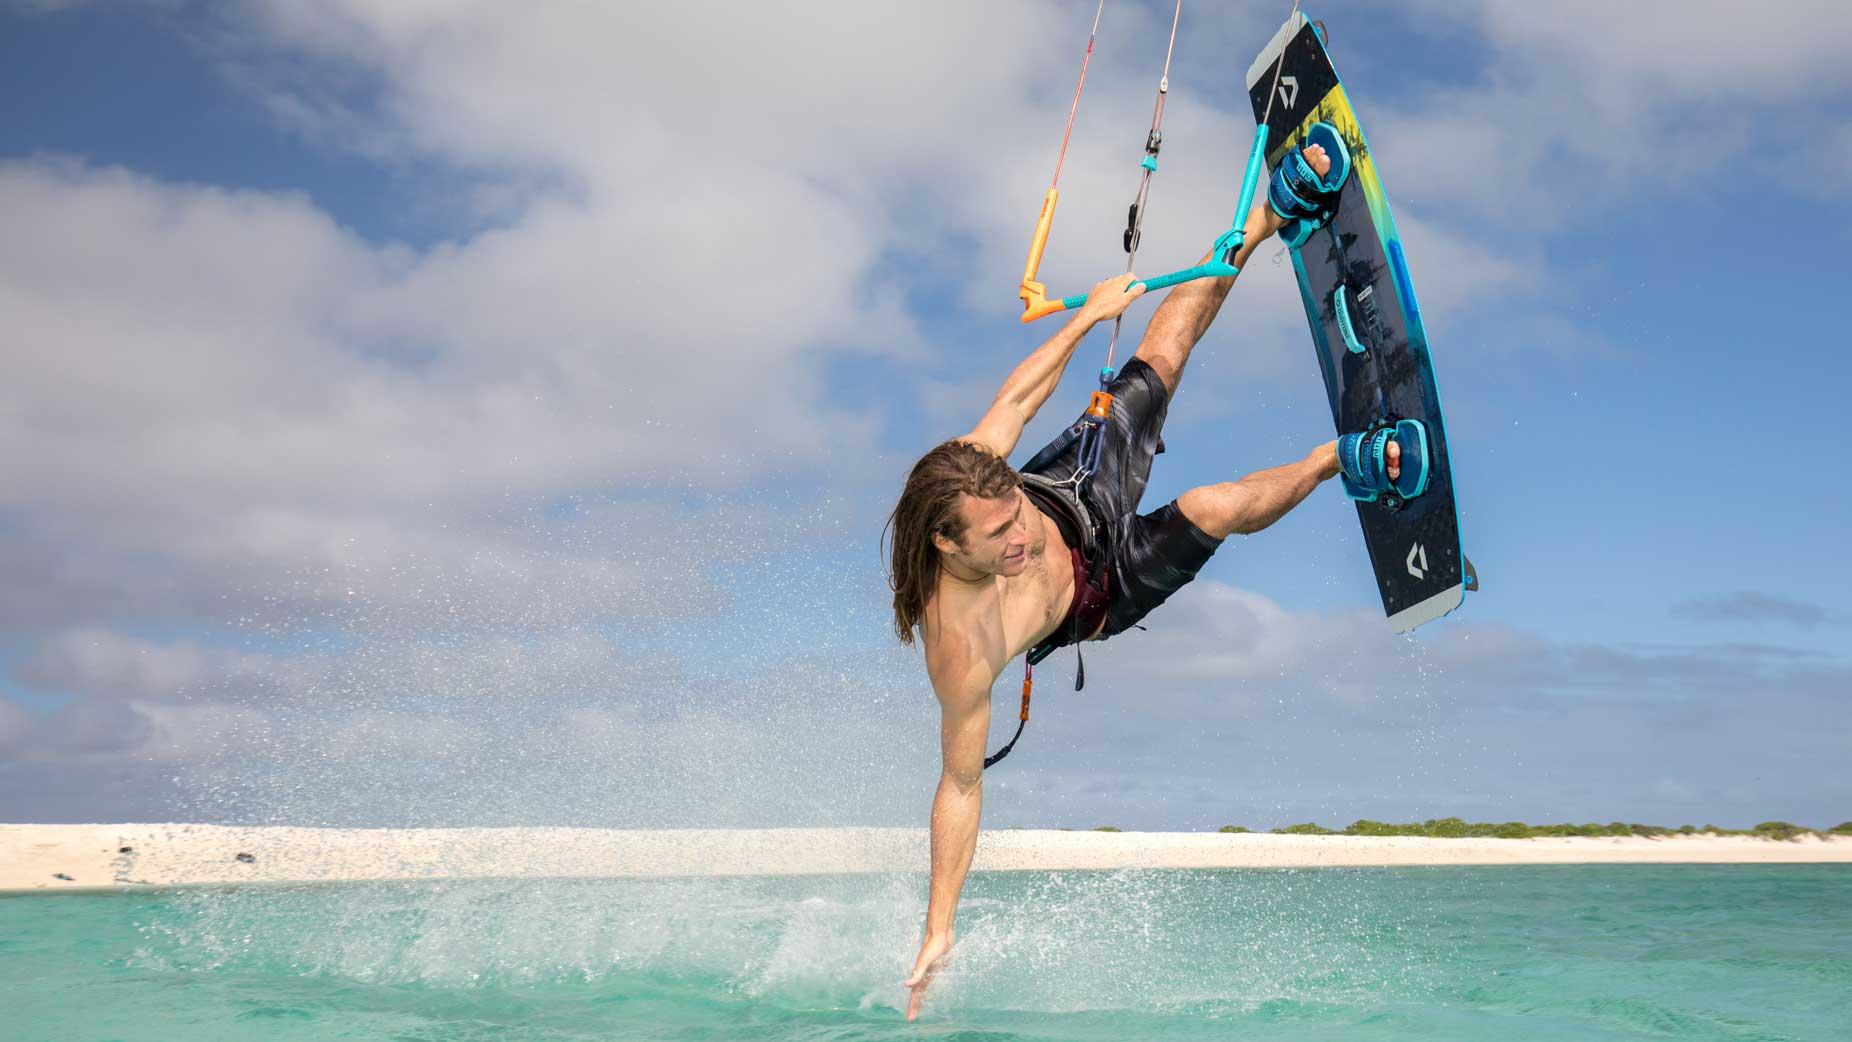 Kitesurfen DUOTONE TRUST BAR QUAD CONTROL 24 METER KITE BAR QUICK RELEASE FREESTYLE KIT Bars